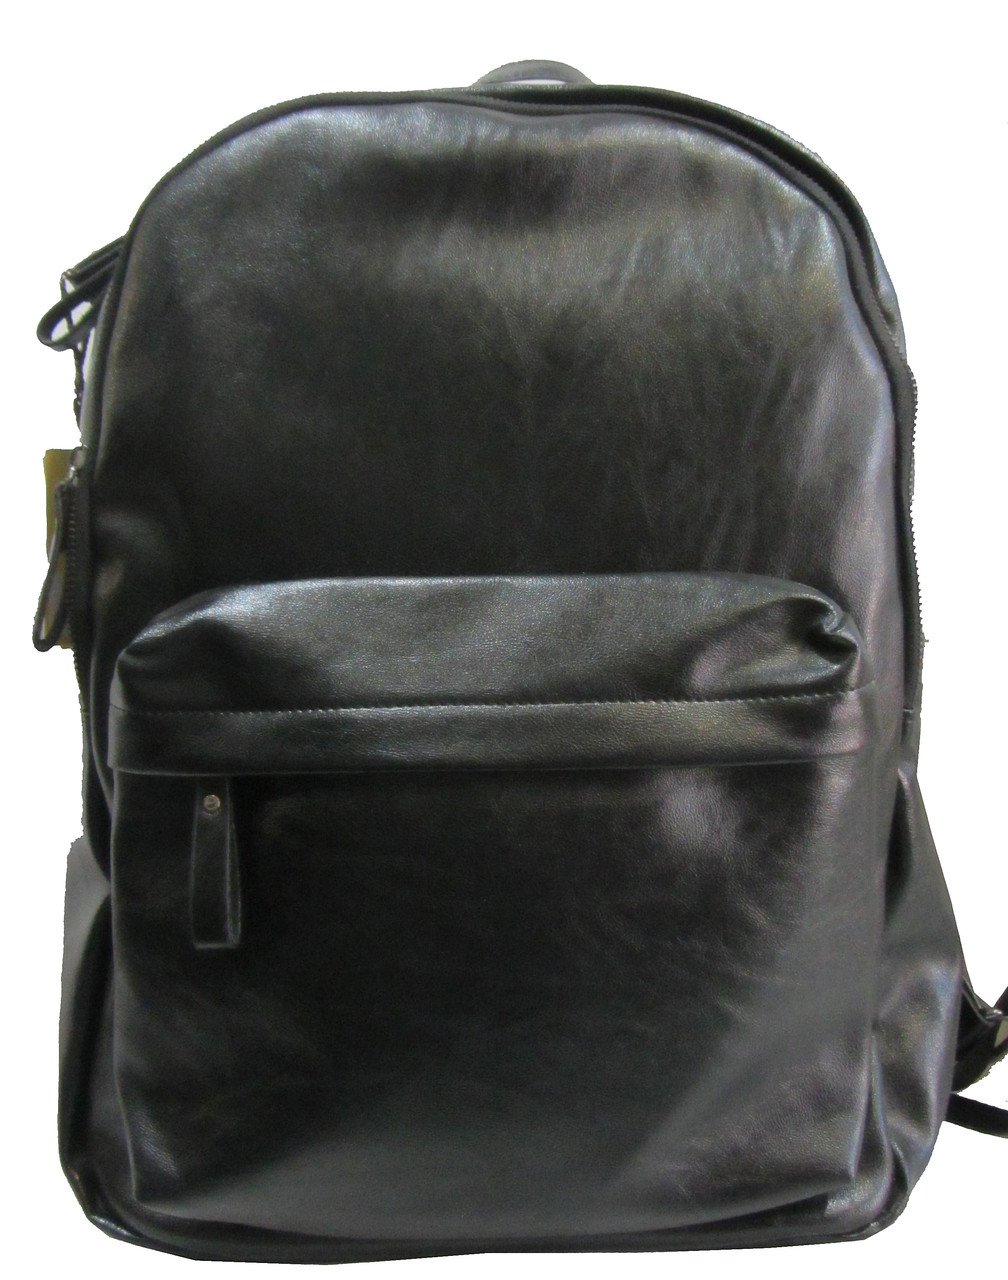 Рюкзаки в школу недорого рюкзак охотника минск